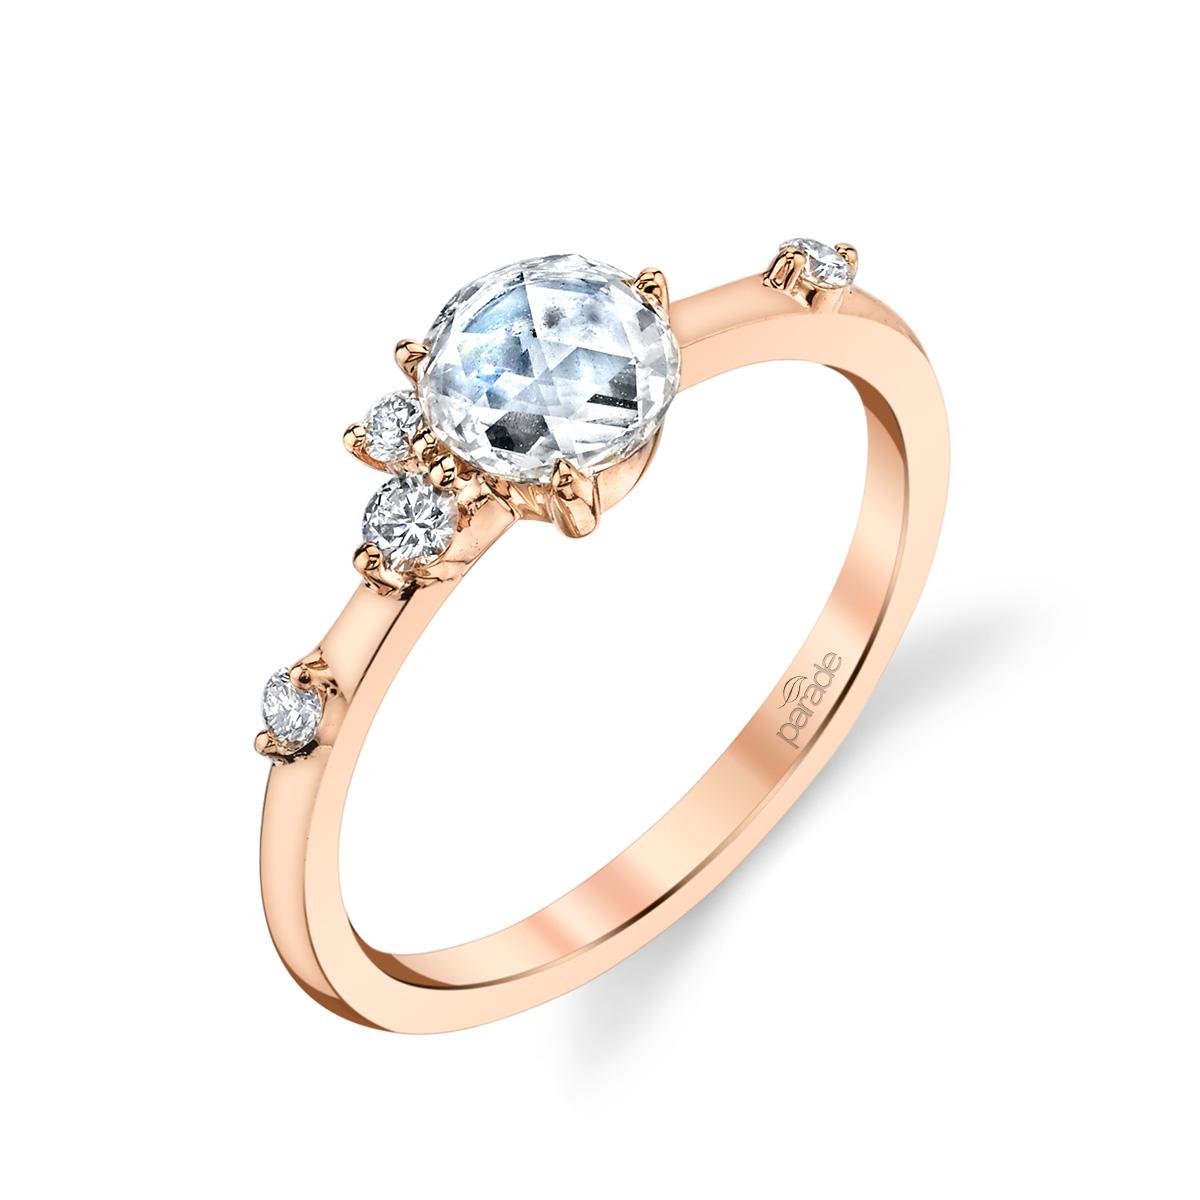 Designer diamond engagement ring with rose cut diamond by Parade Design.